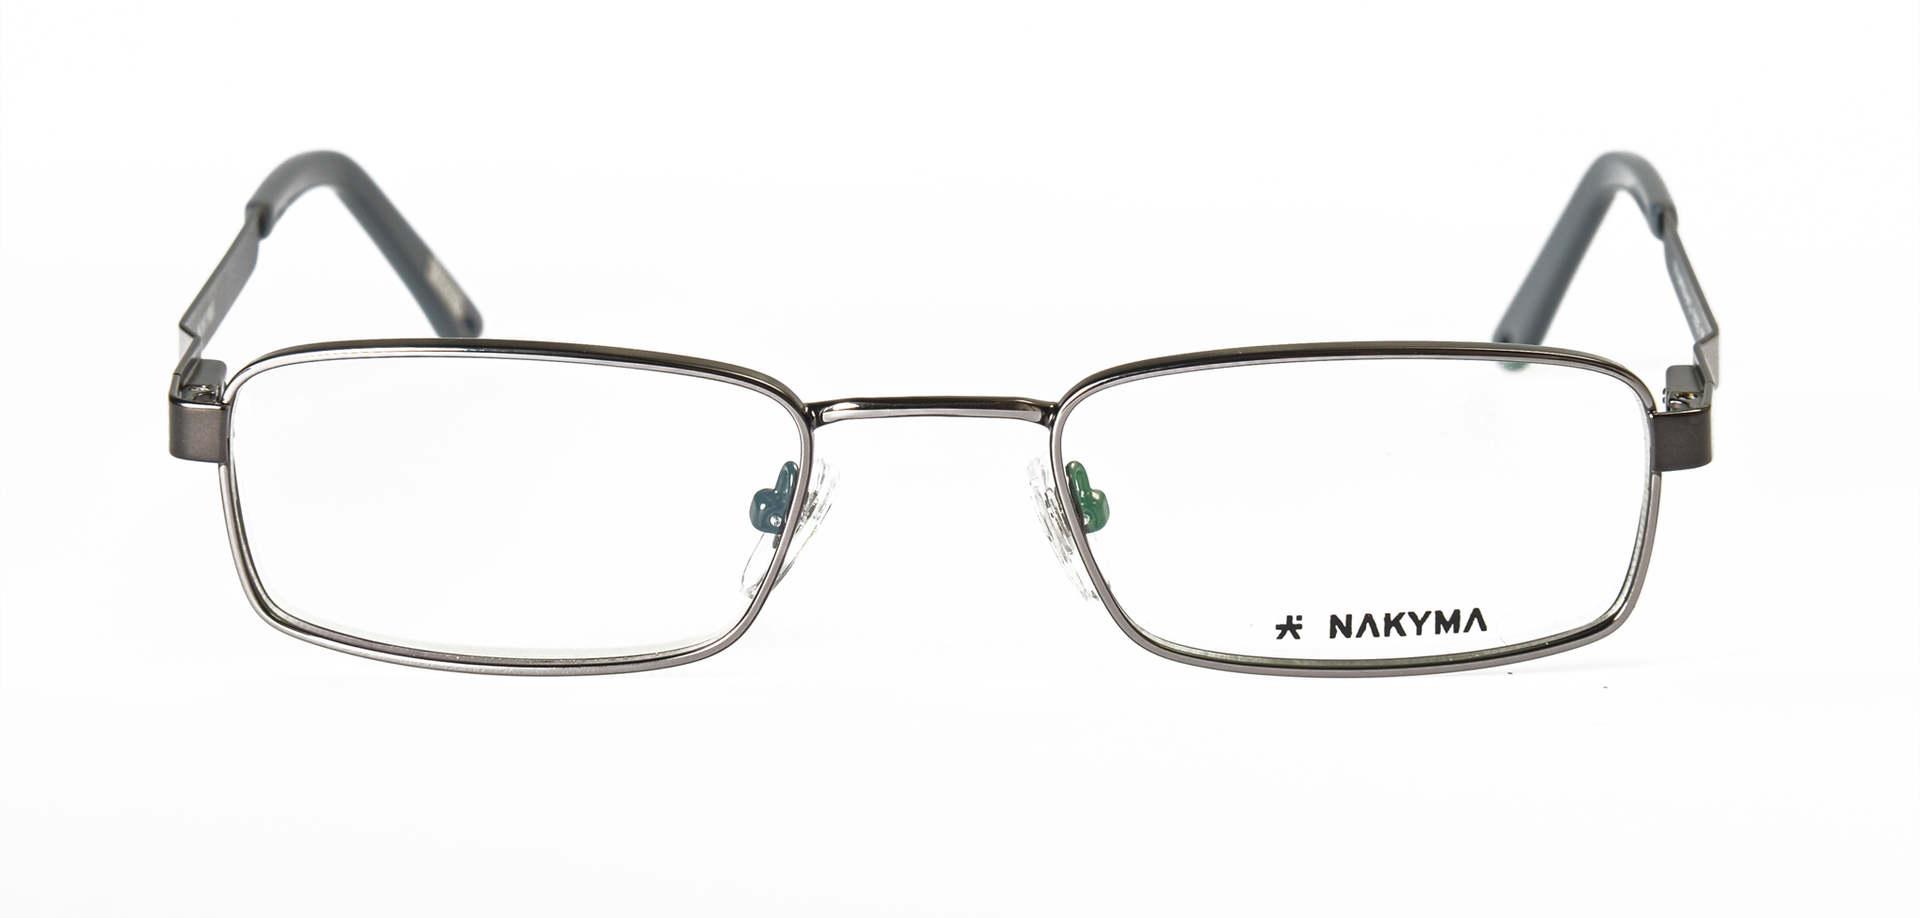 8R1-NAKYMA-04 C3